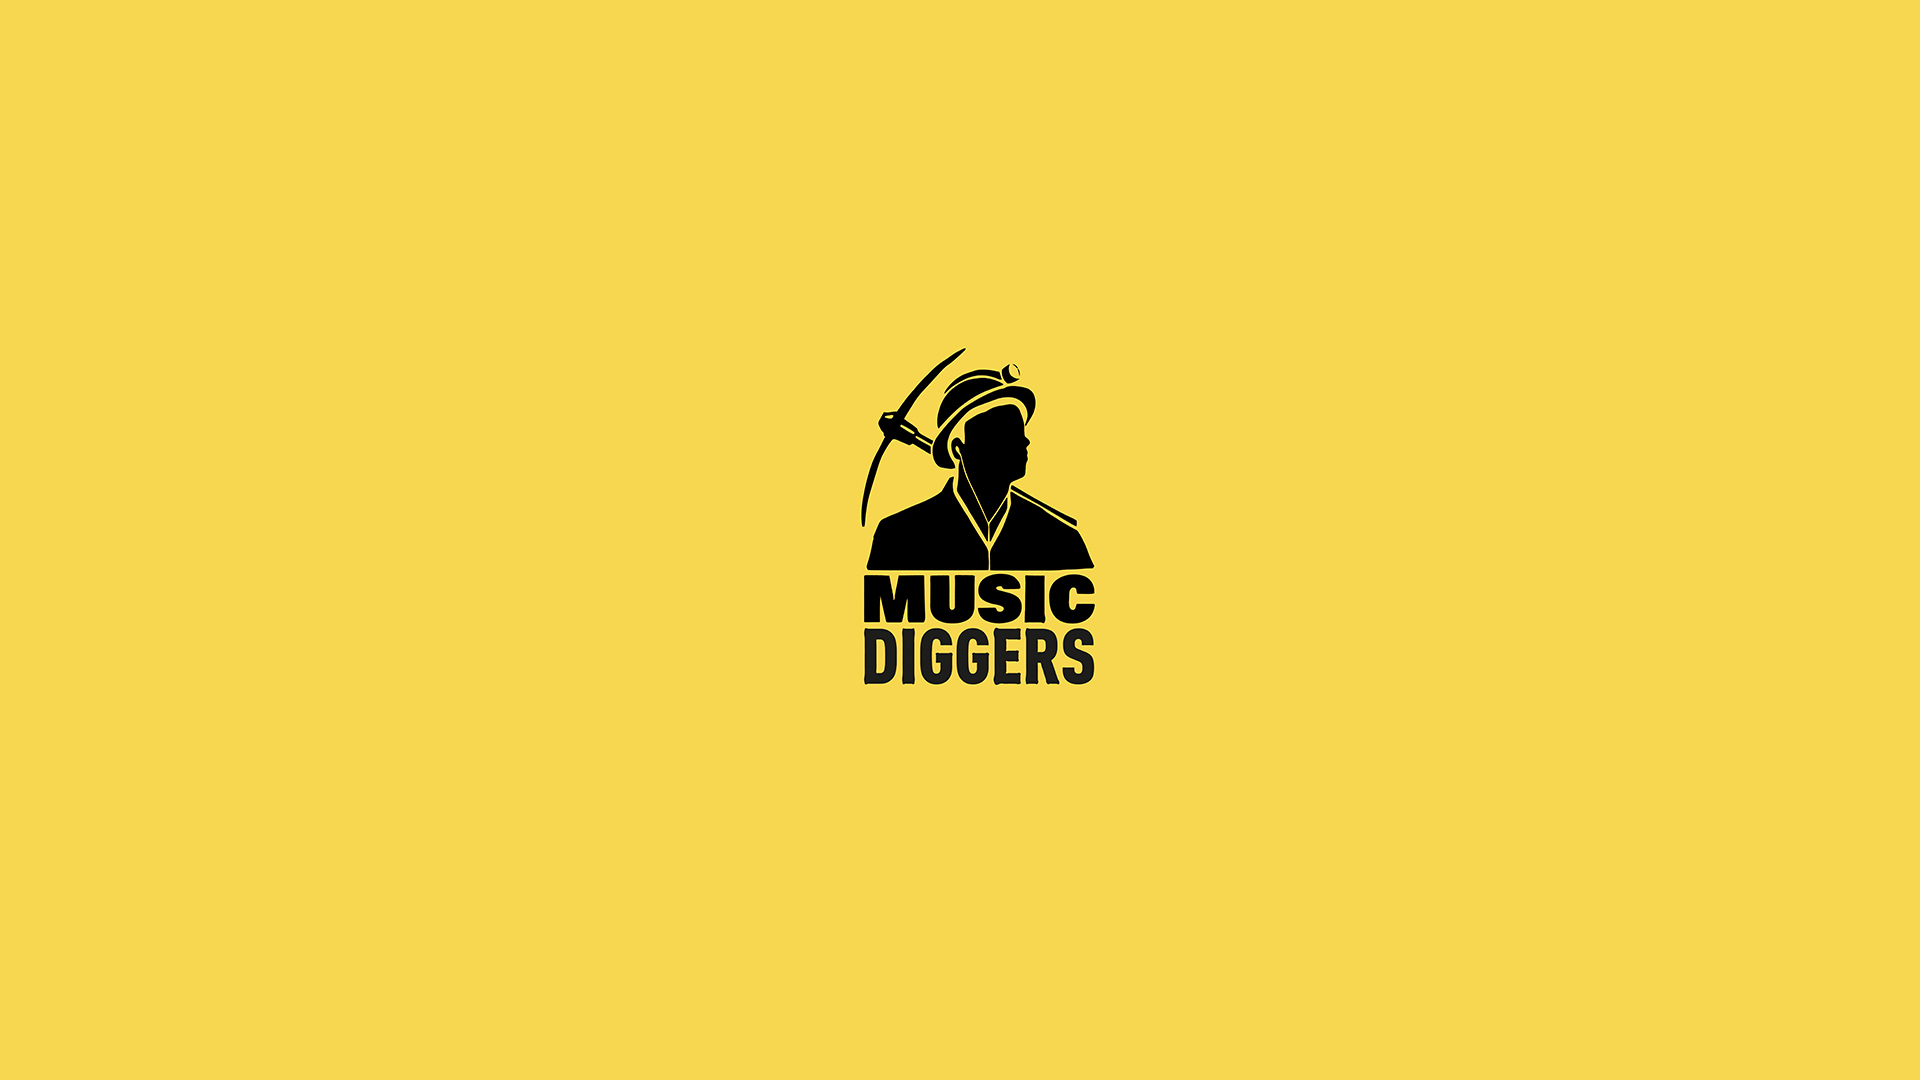 Music Diggers